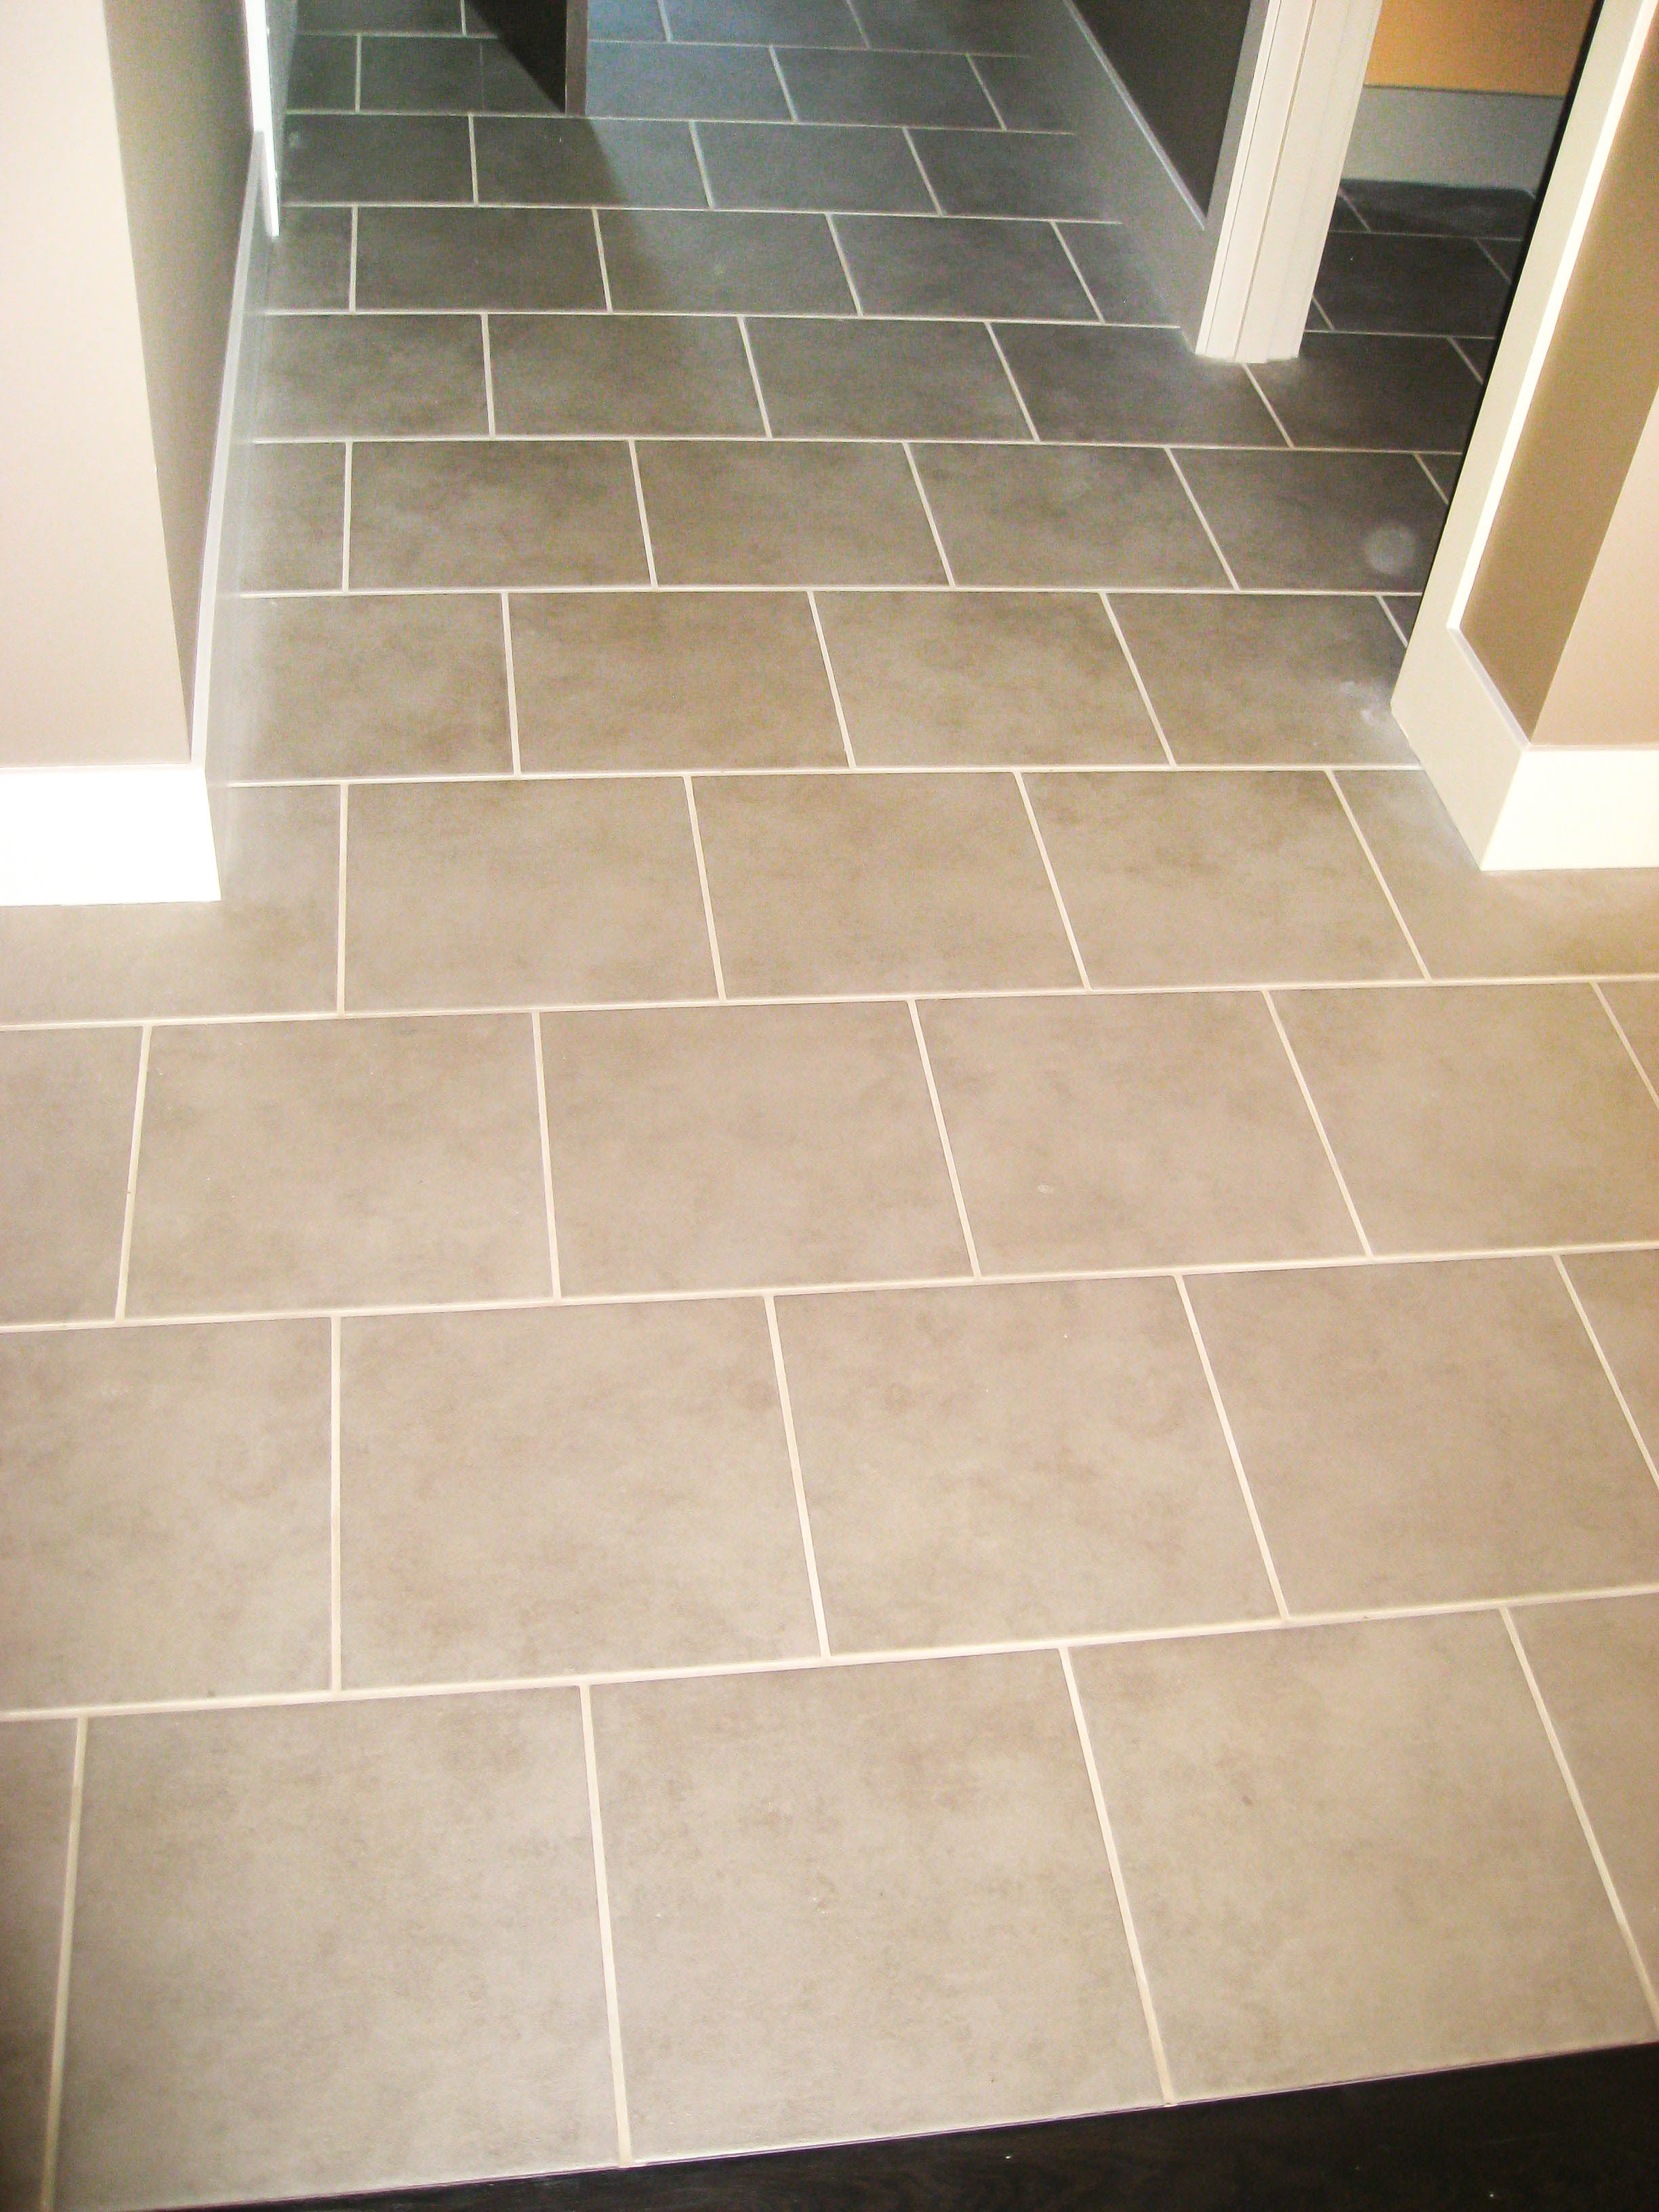 Tile Floor Photos Gallery  Seattle Tile Contractor  IRC